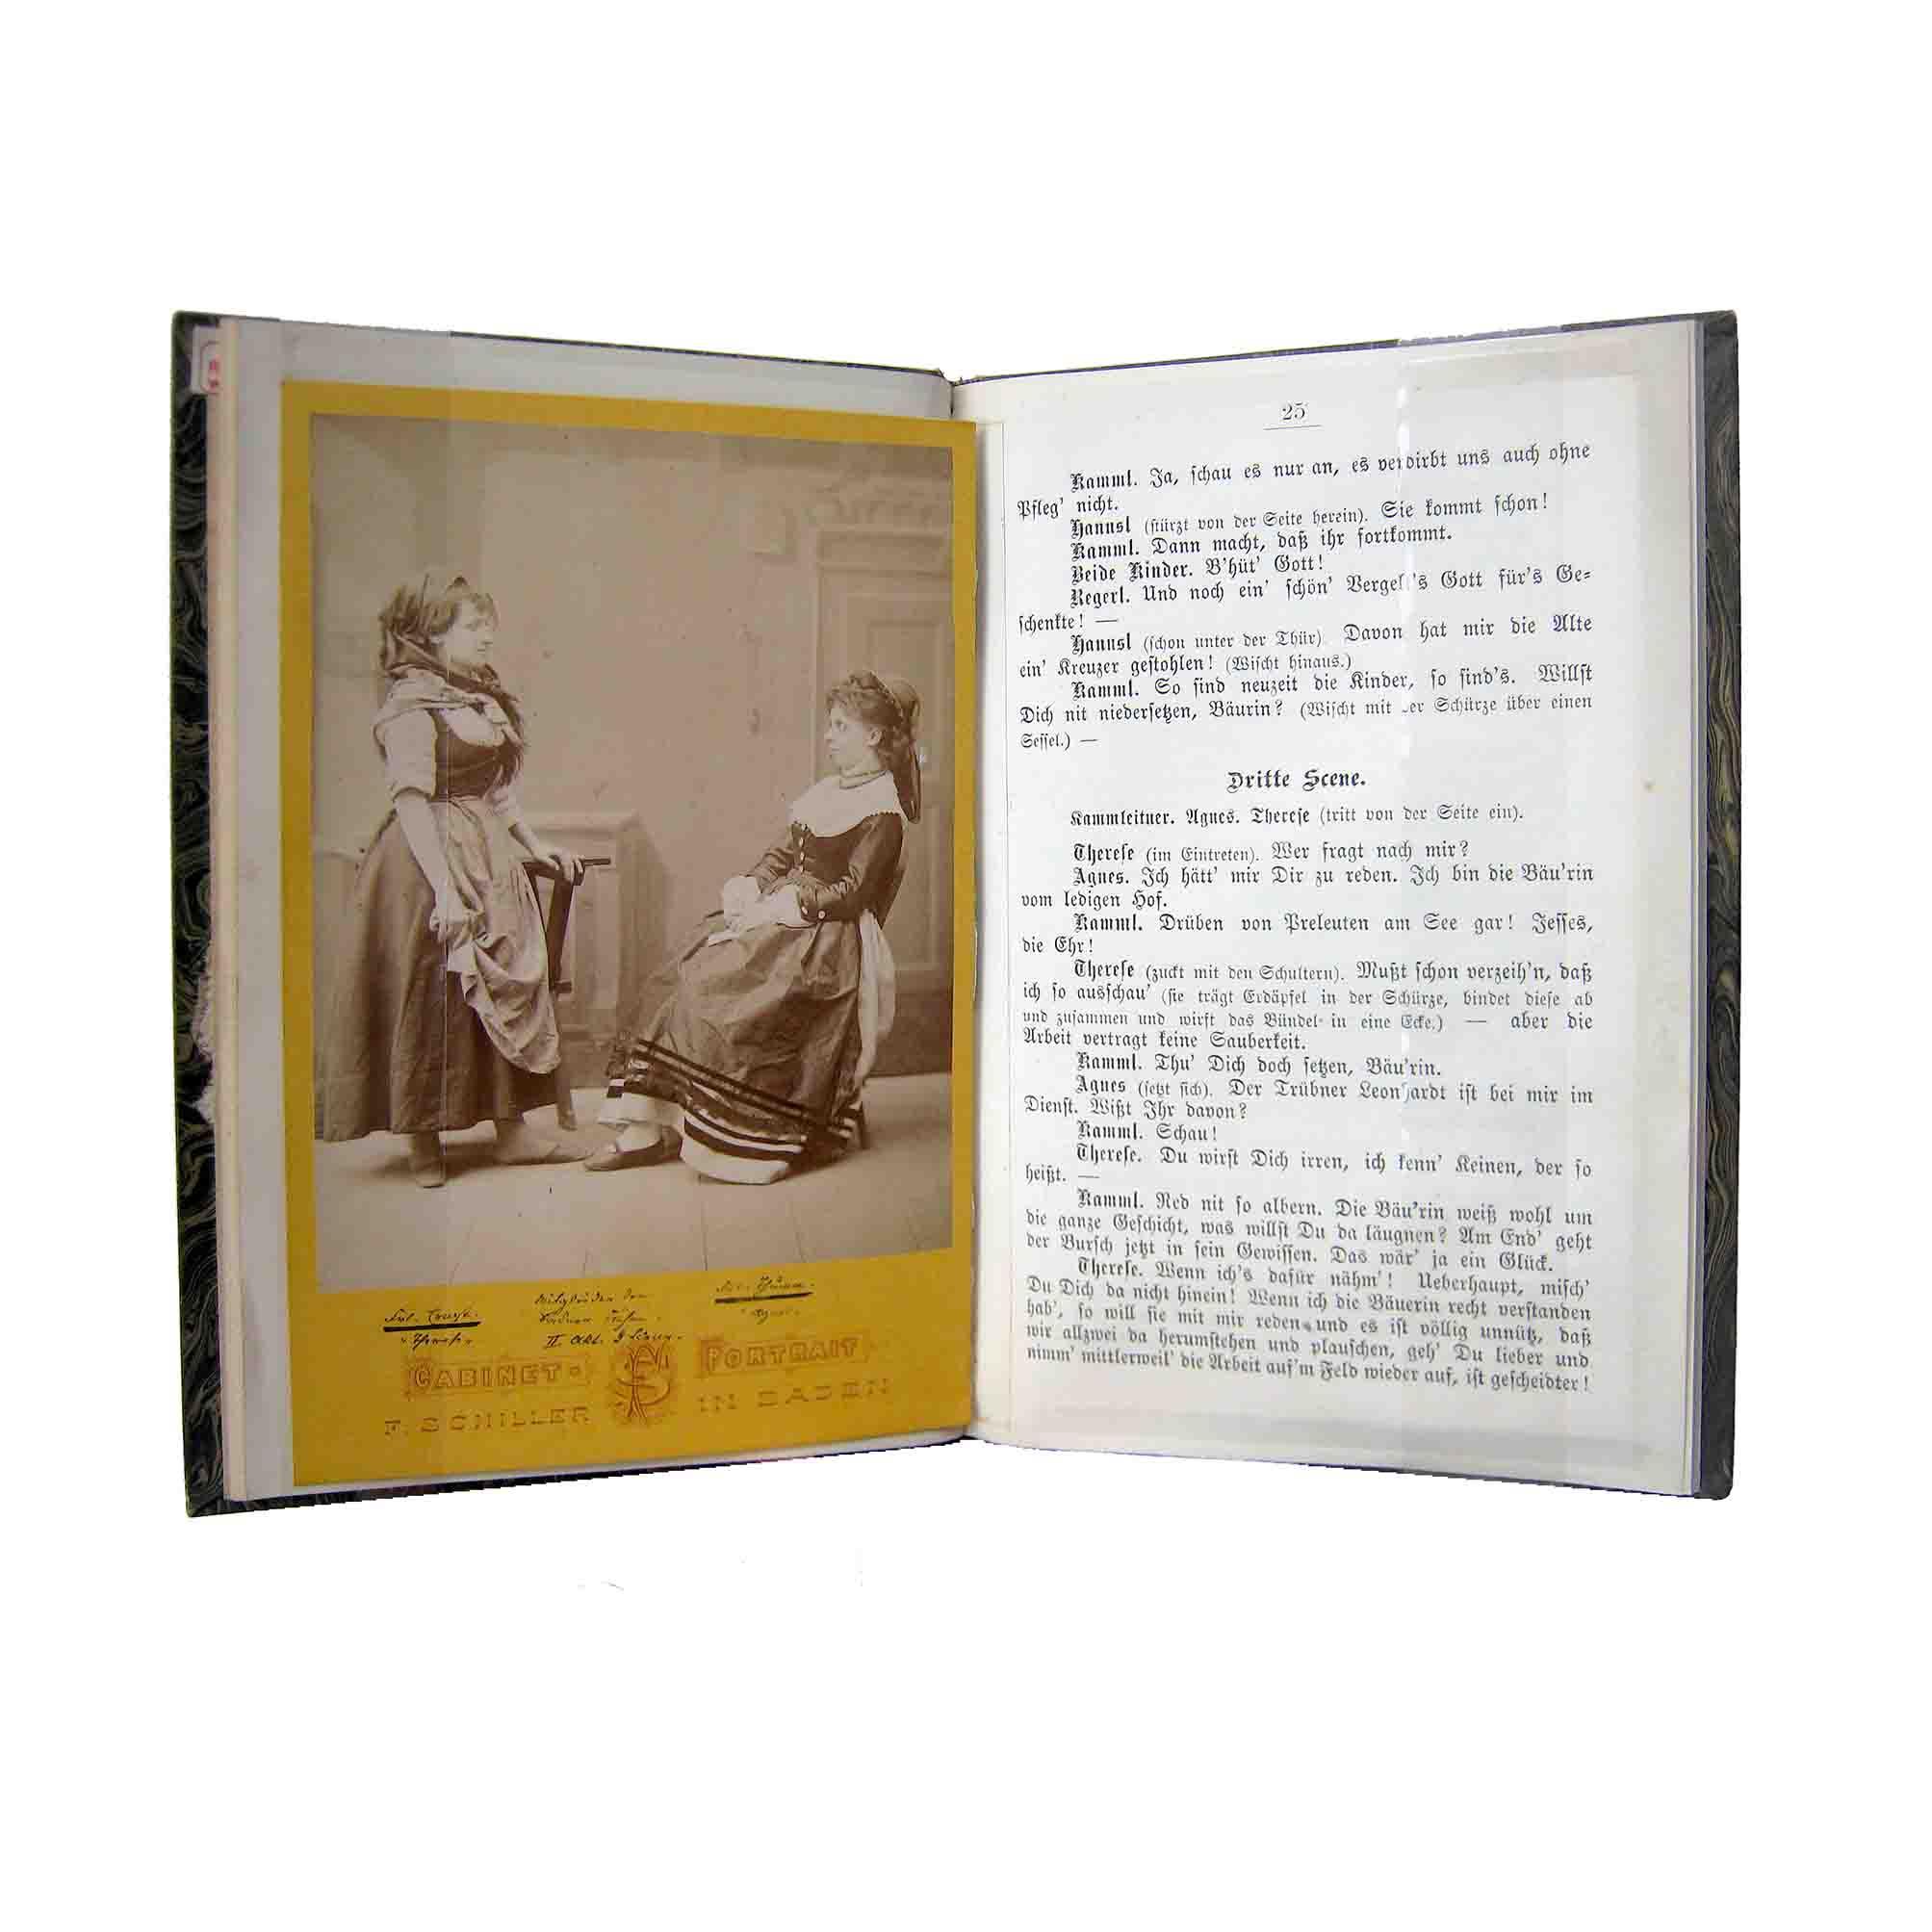 5674-Anzengruber-Hof-Rollenfotos-1877-Rollenfoto-frei-N.jpg